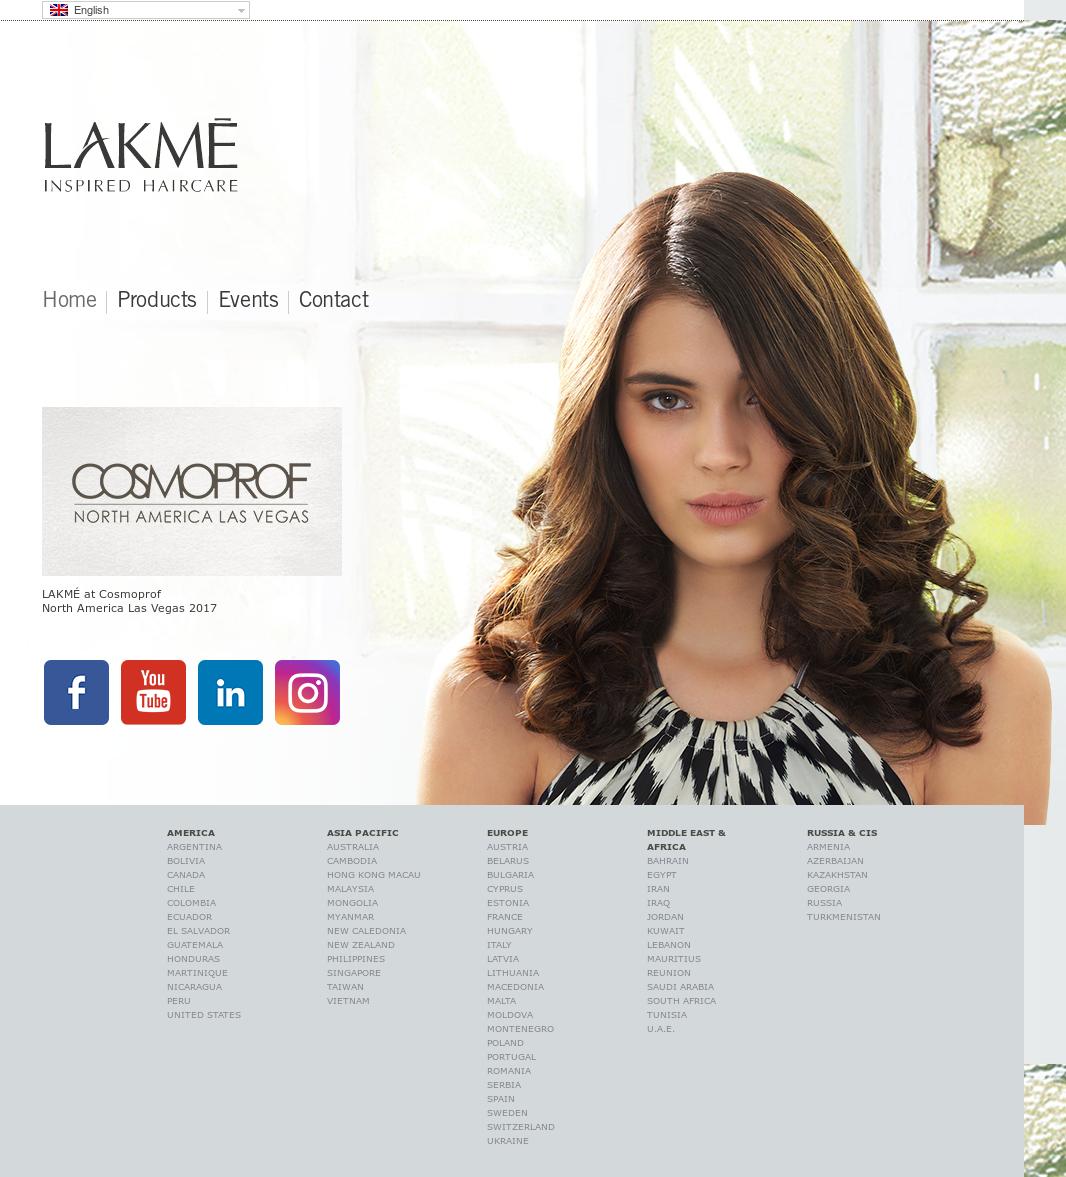 Lakme cosmetics company profile